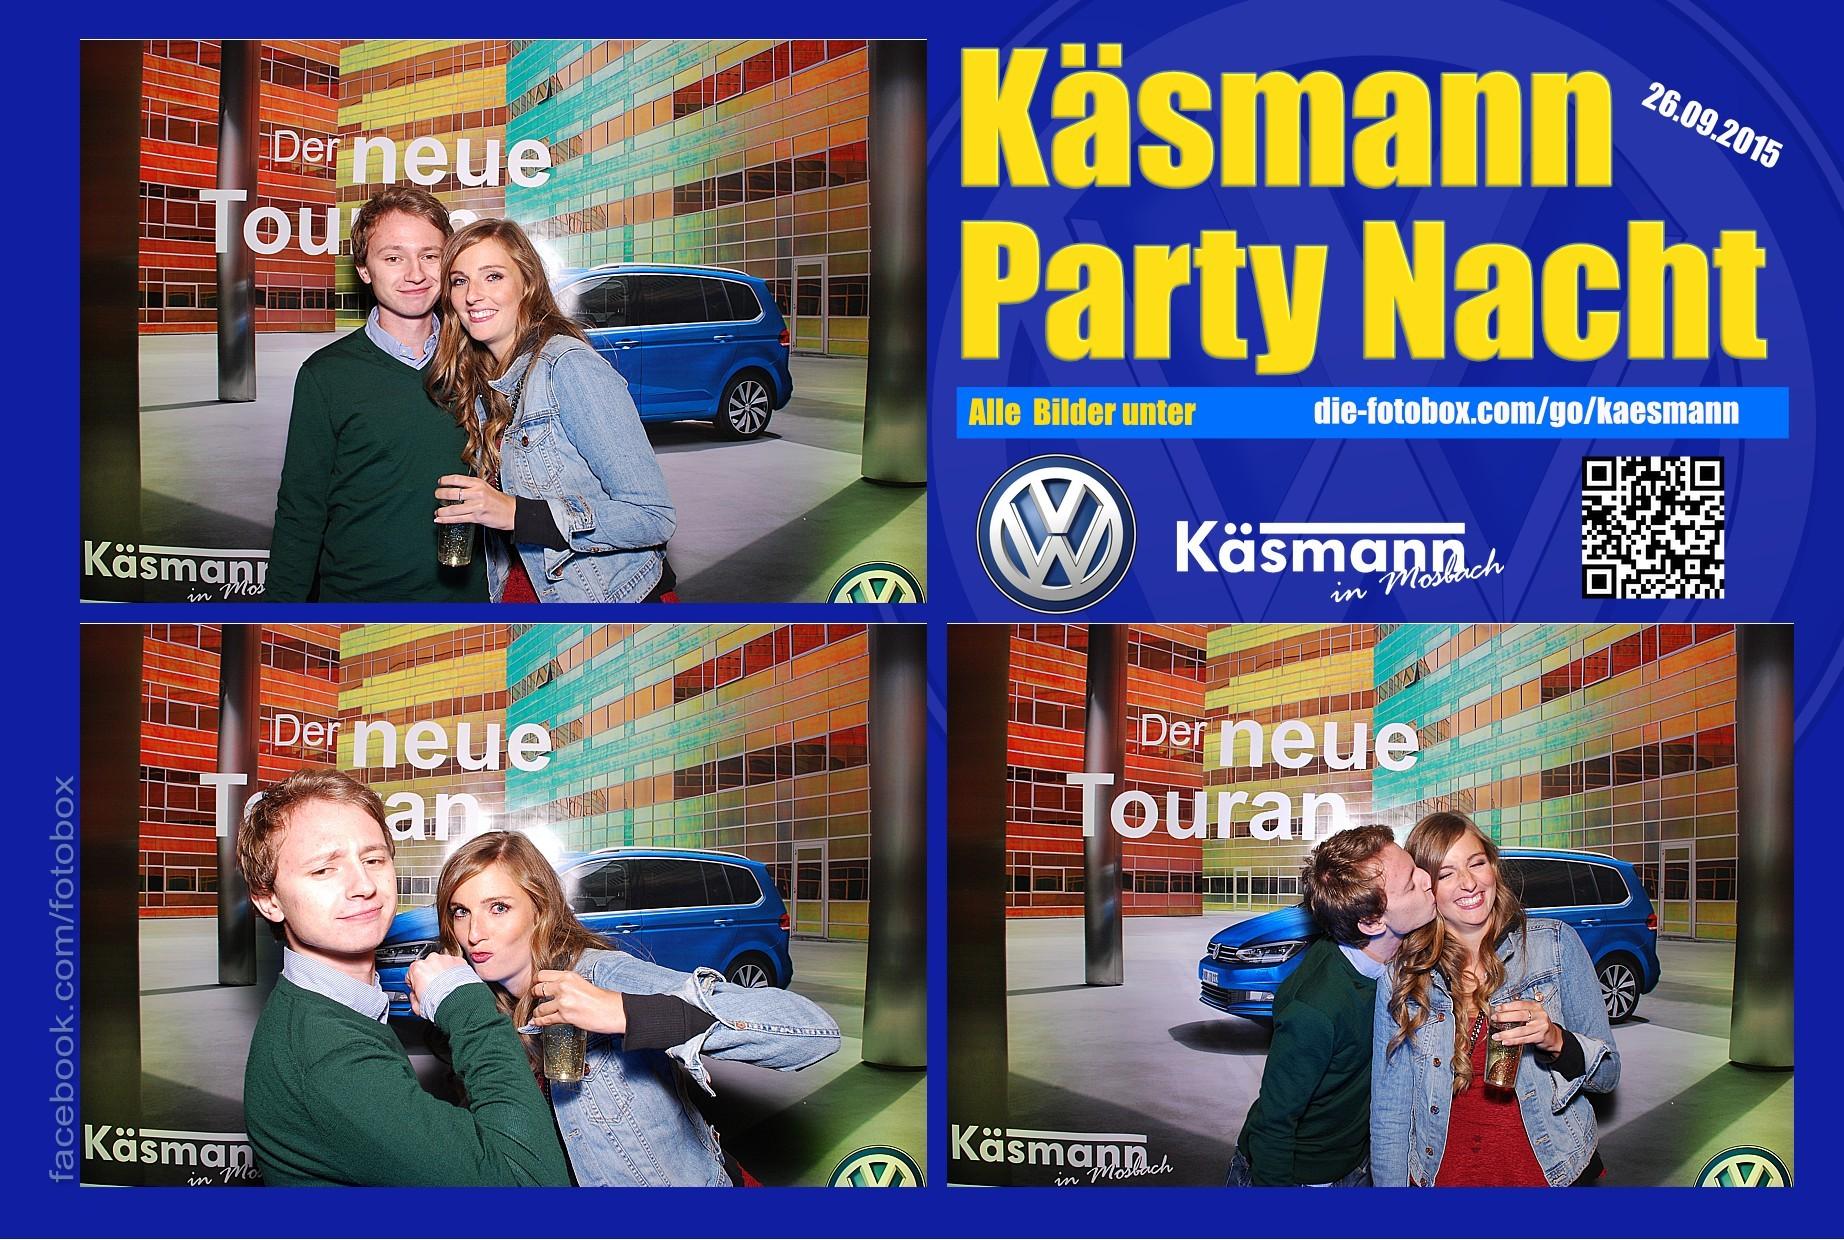 Käsmannparty 2015 - www.die-fotobox.com 01272